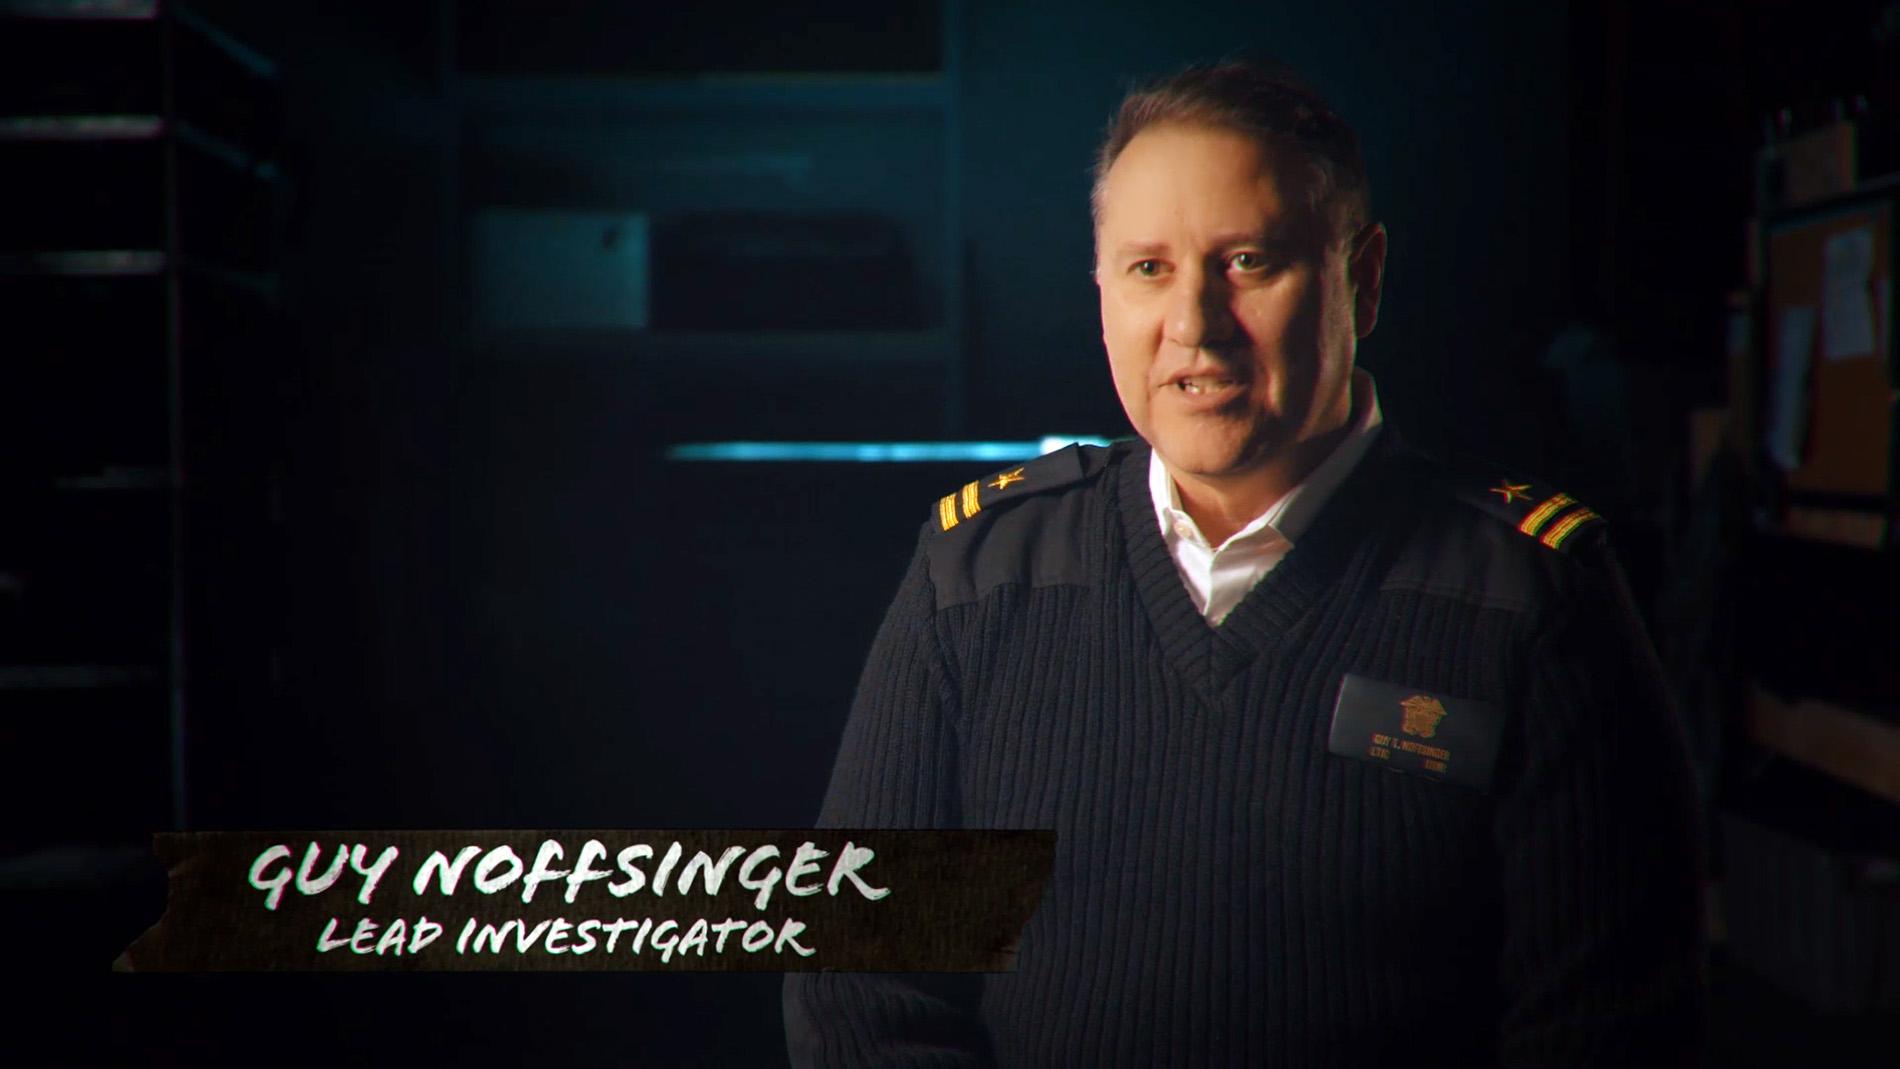 Guy Noffsinger